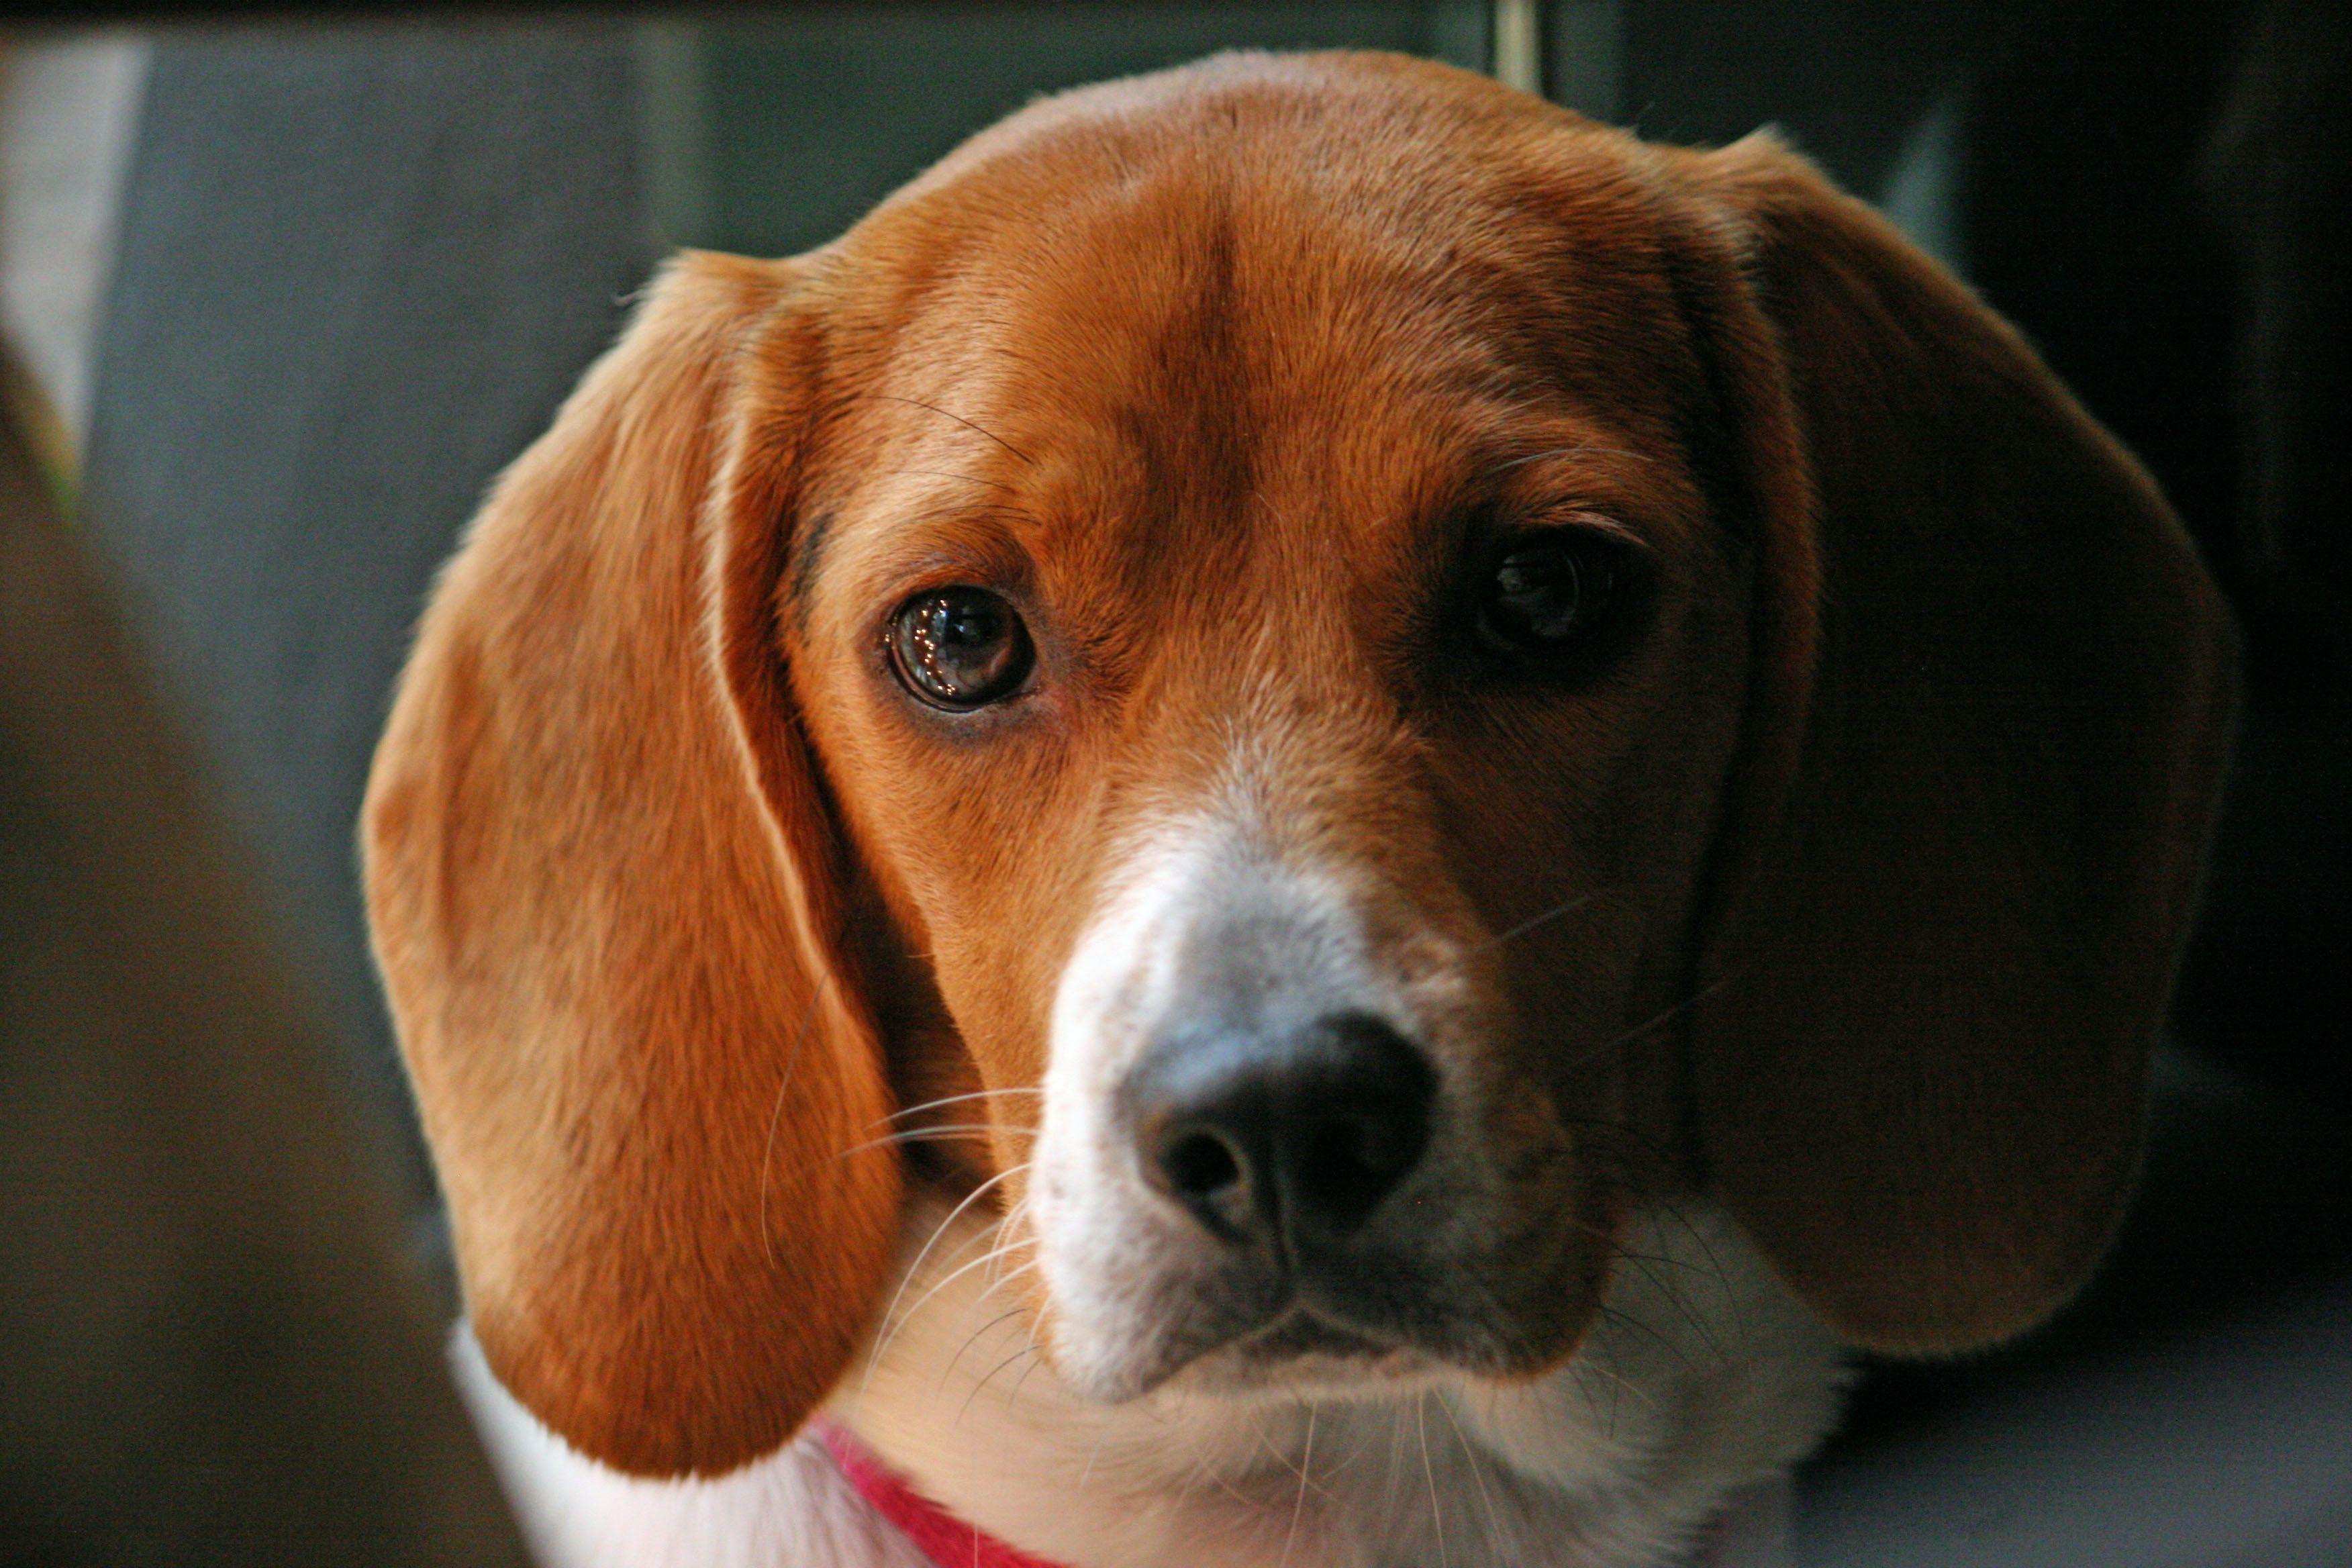 Beagles Wallpapers Beagle Pupys Face Top 10 Dog Breeds Dogs Beagle